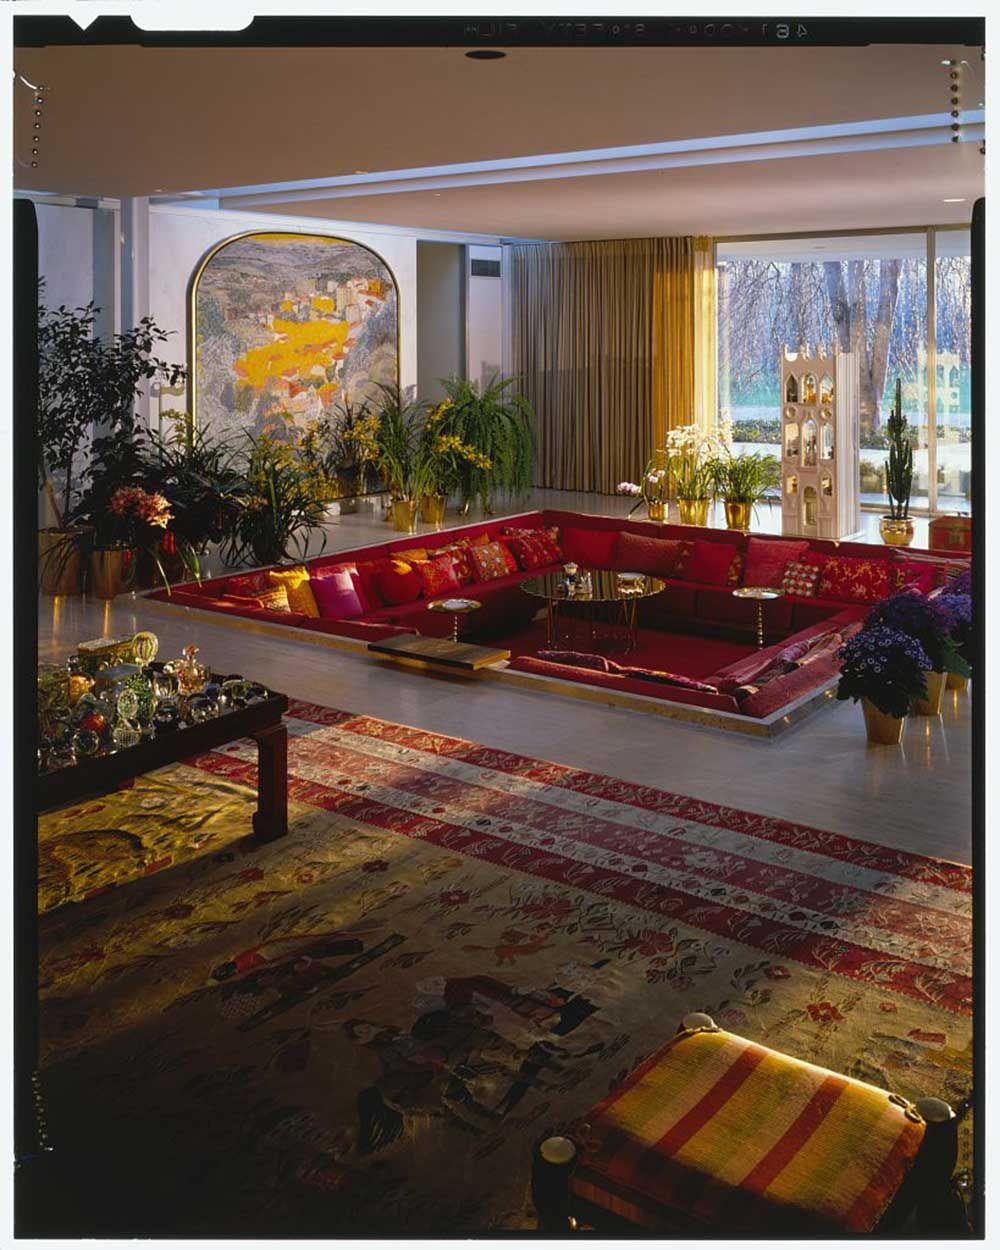 52 Balthazar Korab photos of The Miller House – an exceptional legacy –